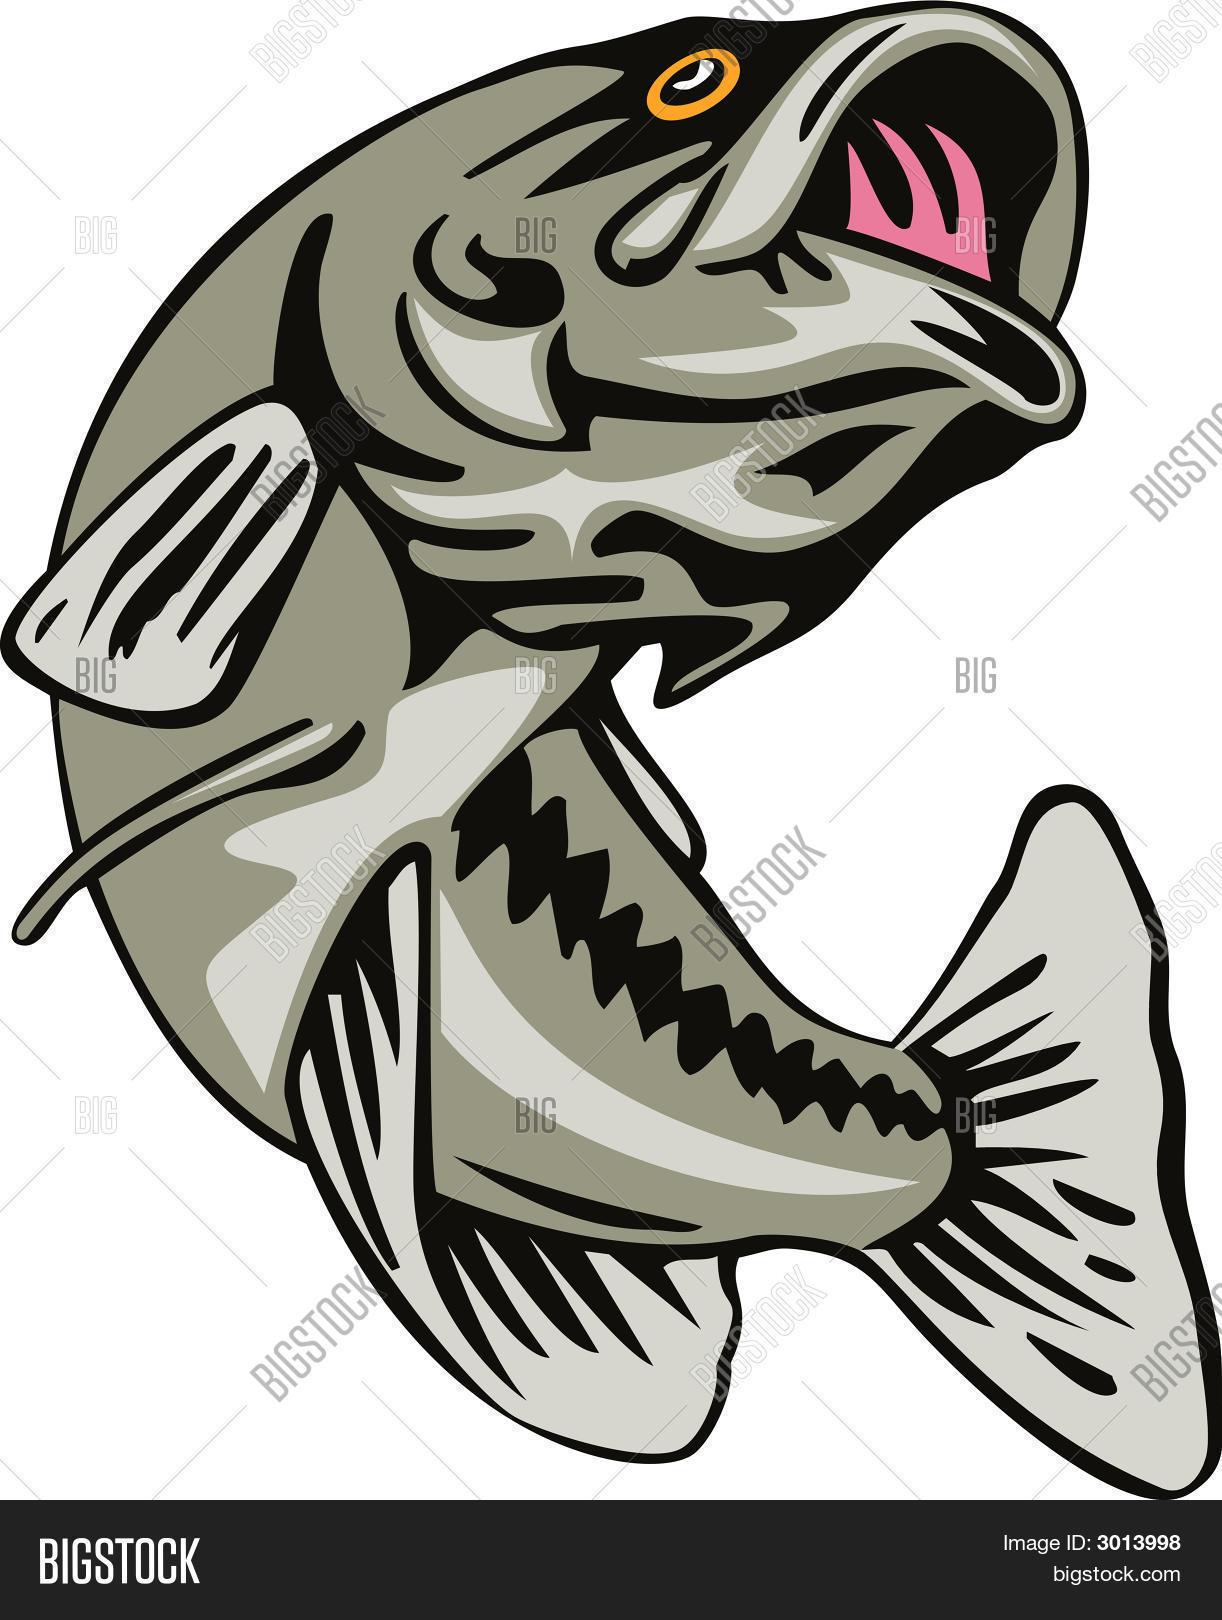 Bass Fishing Images, Illustrations, Vectors - Bass Fishing Stock ...